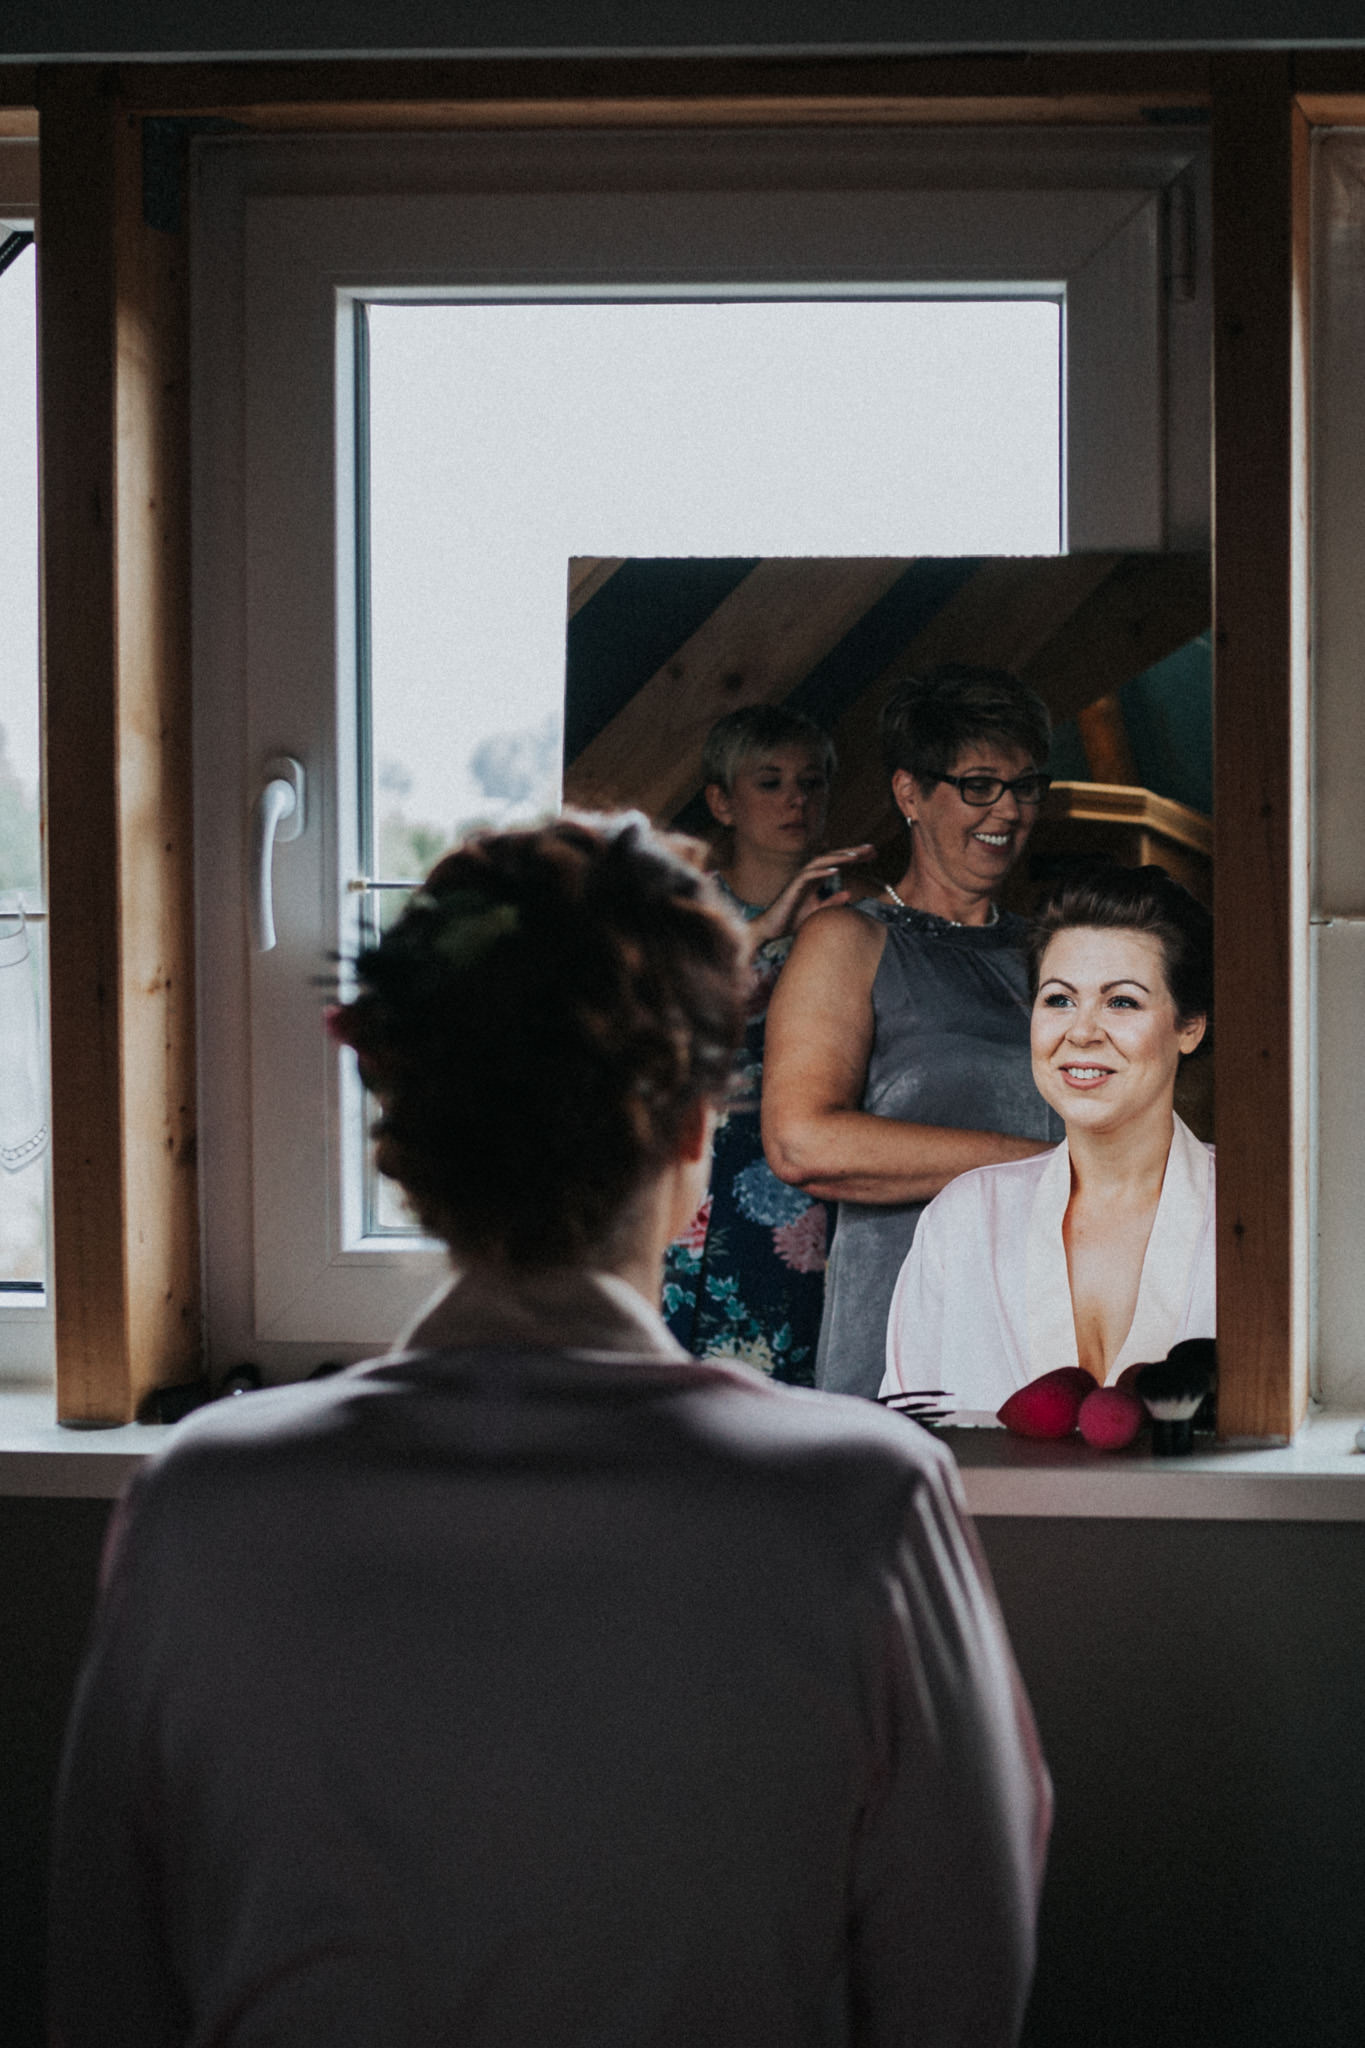 Hochzeitsfotograf-Homberg-14.jpg